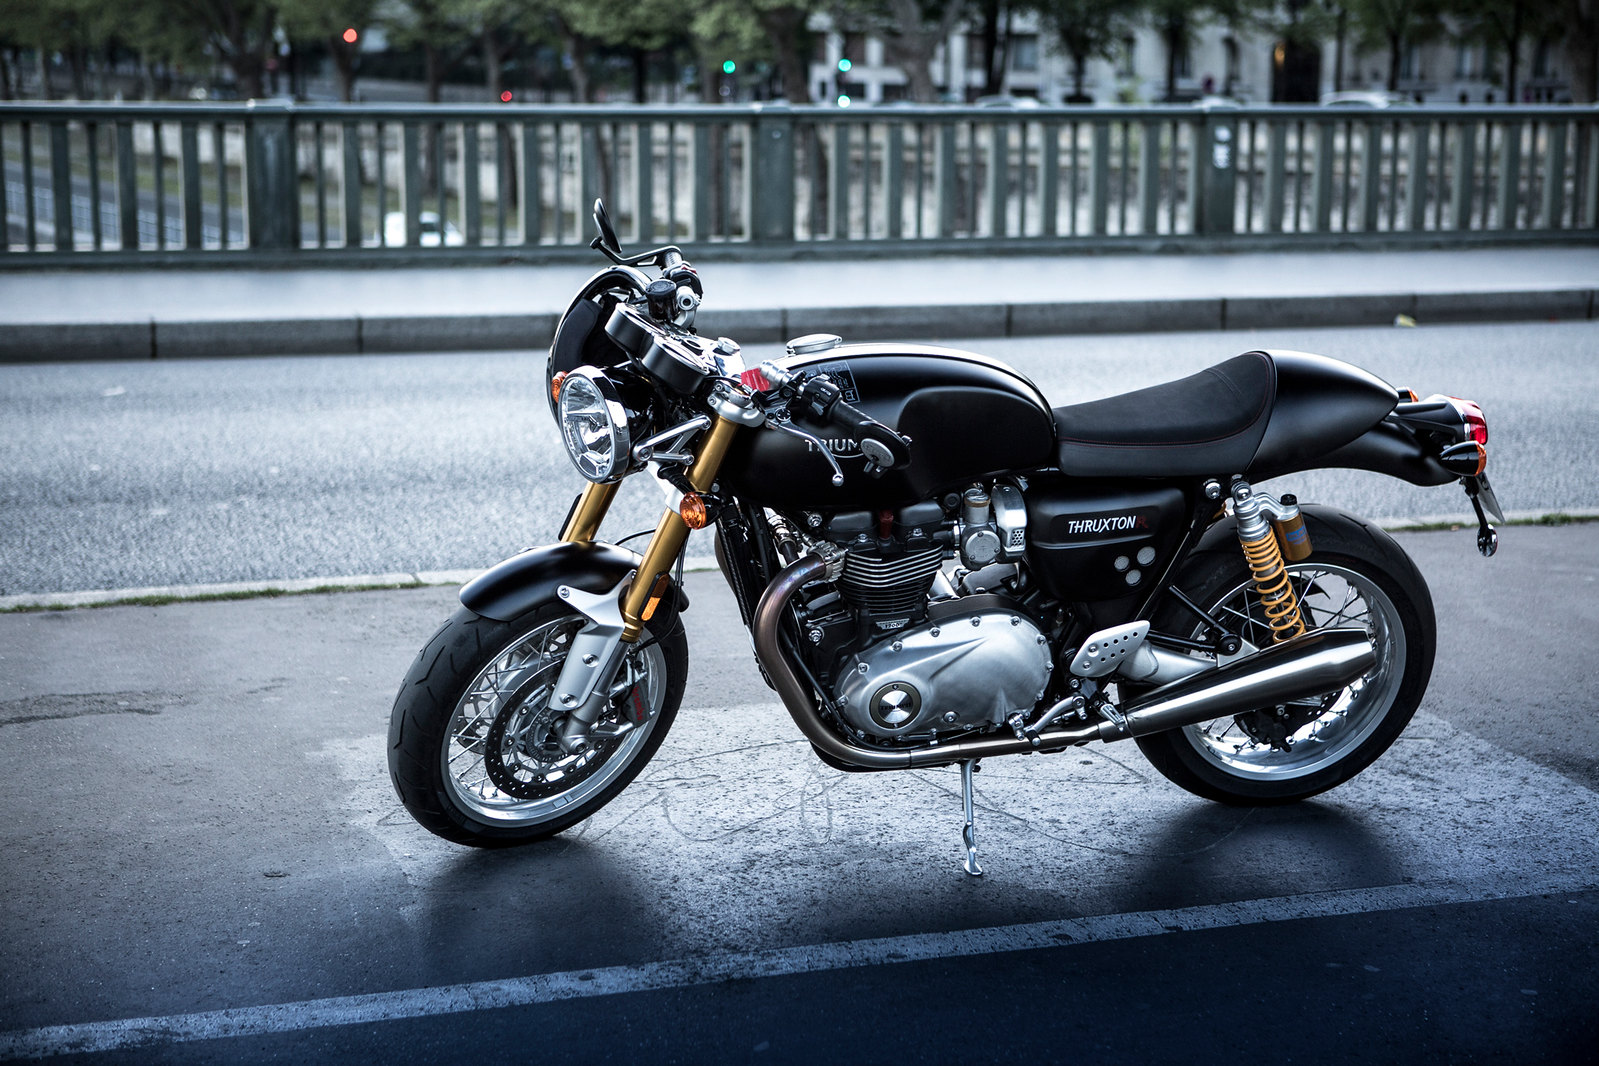 essai moto triumph thruxton r balade en pleine air blog auto cars passion. Black Bedroom Furniture Sets. Home Design Ideas